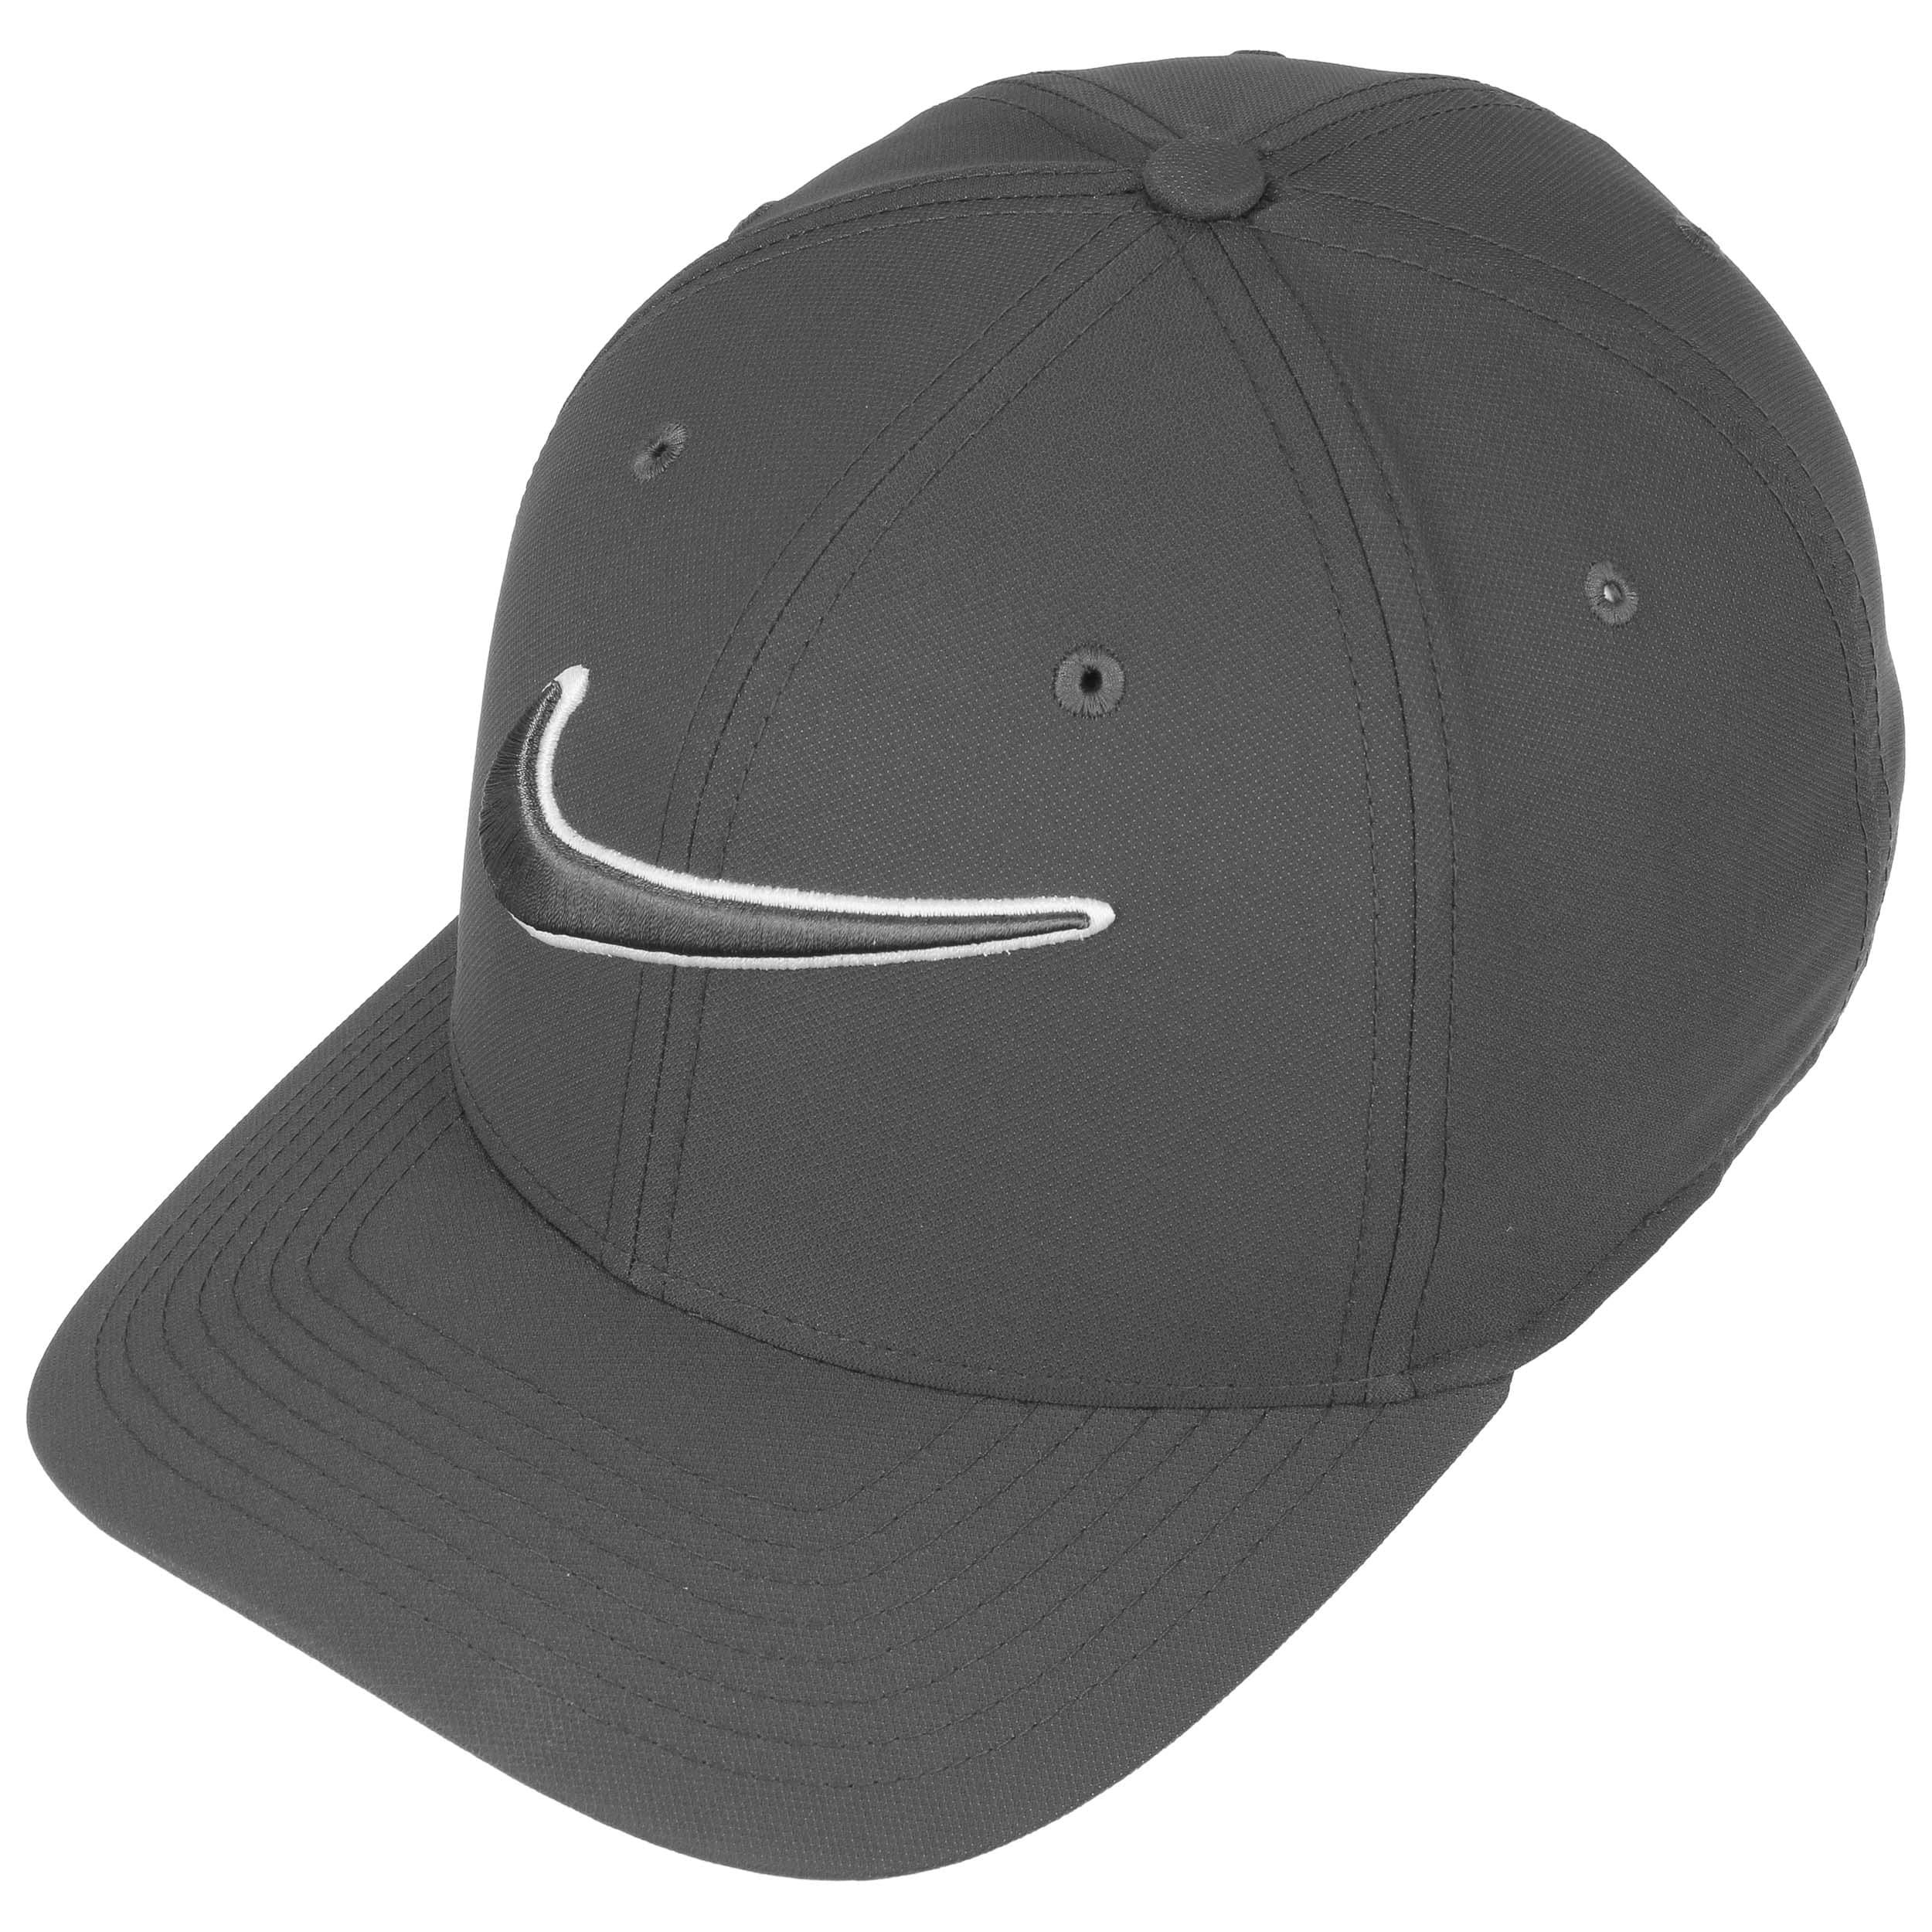 3427d46274726 Golf Classic 99 Performance Cap by Nike - dark grey 1 ...